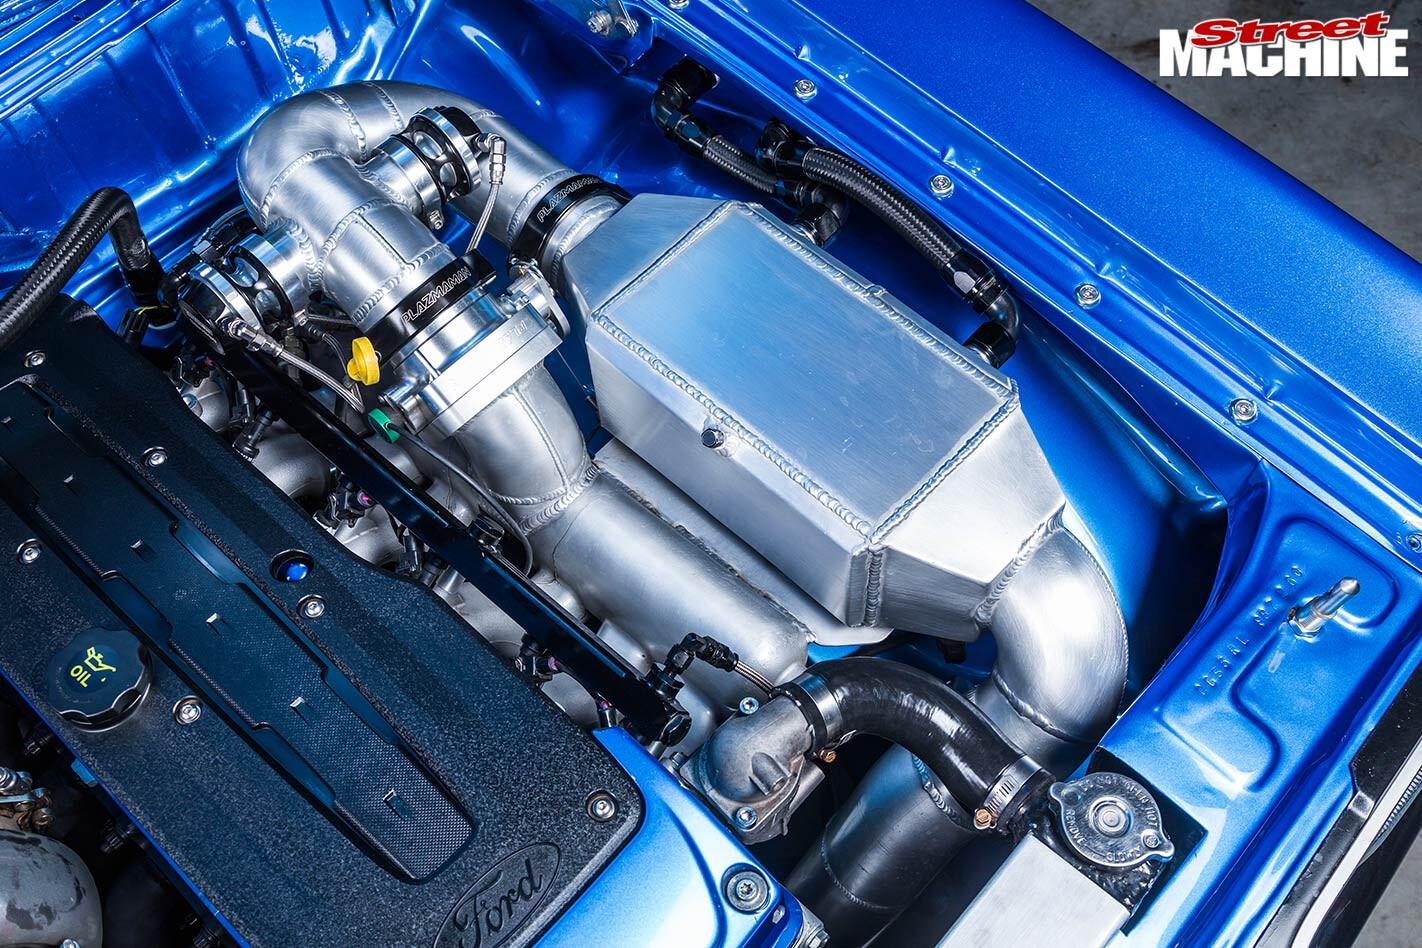 Ford Cortina engine